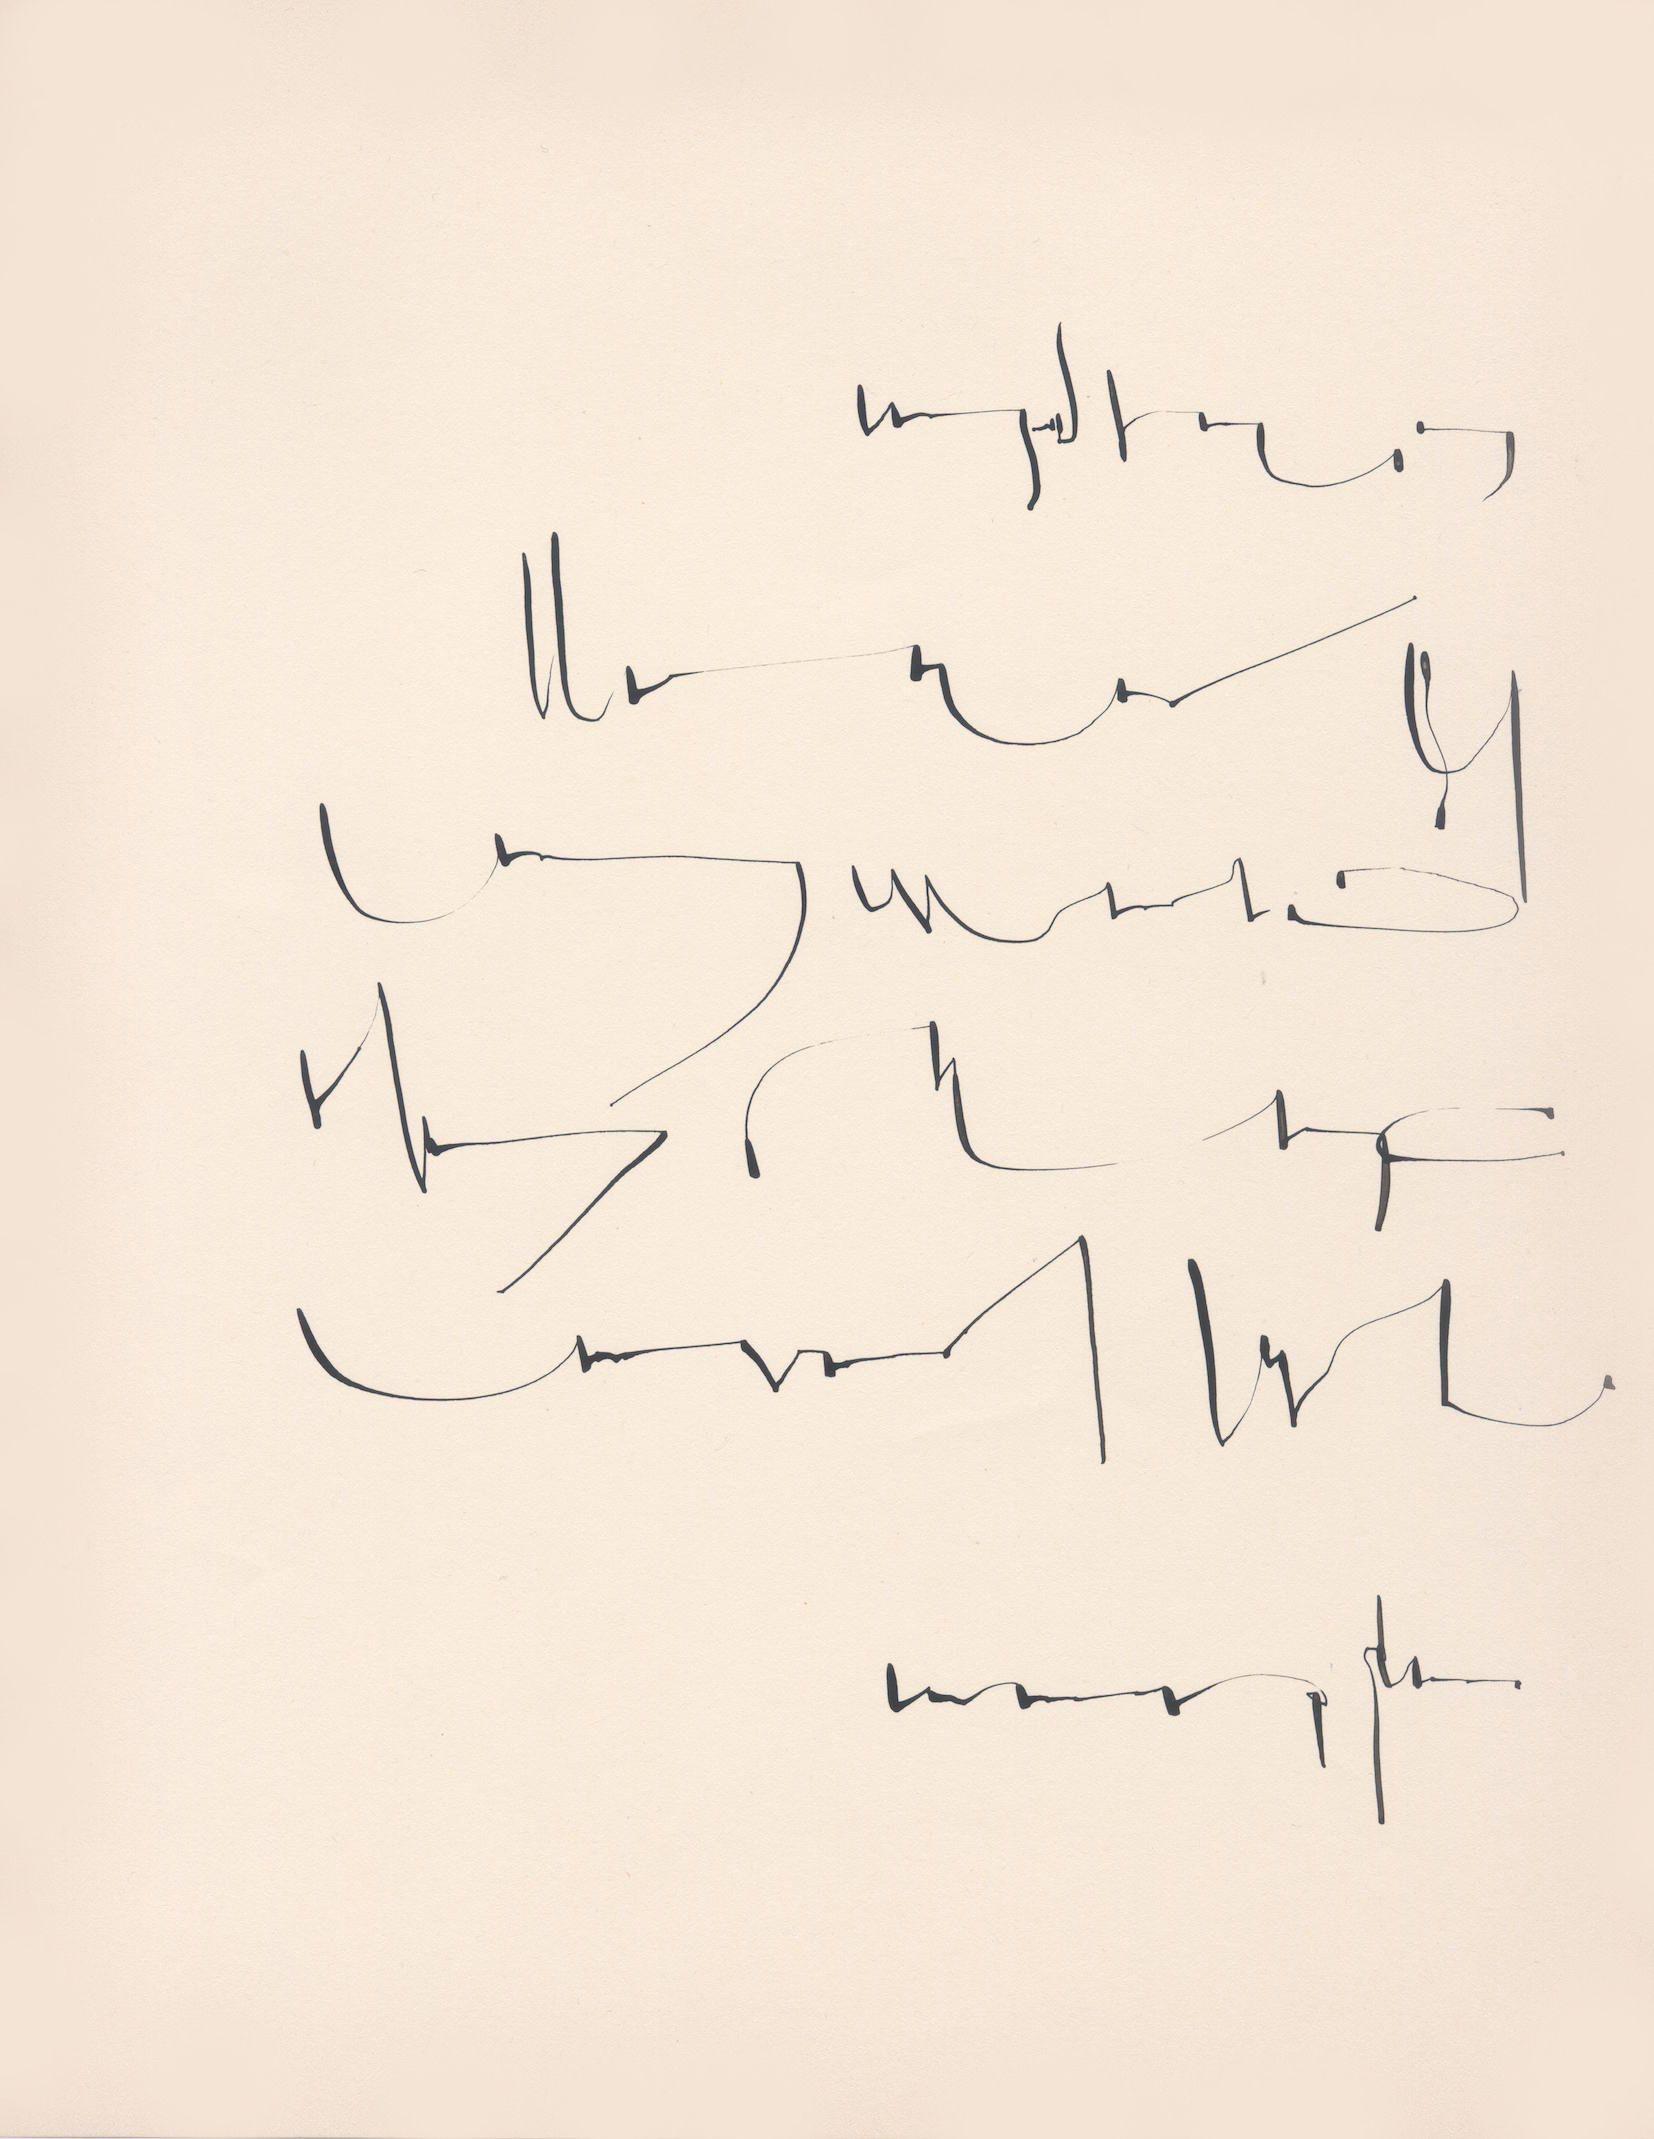 MIRTHA DERMISACHE, Sin título (Carta), c.1970, Tinta sobre papel, 28 x 22,8 cm. En Henrique Faria Buenos Aires